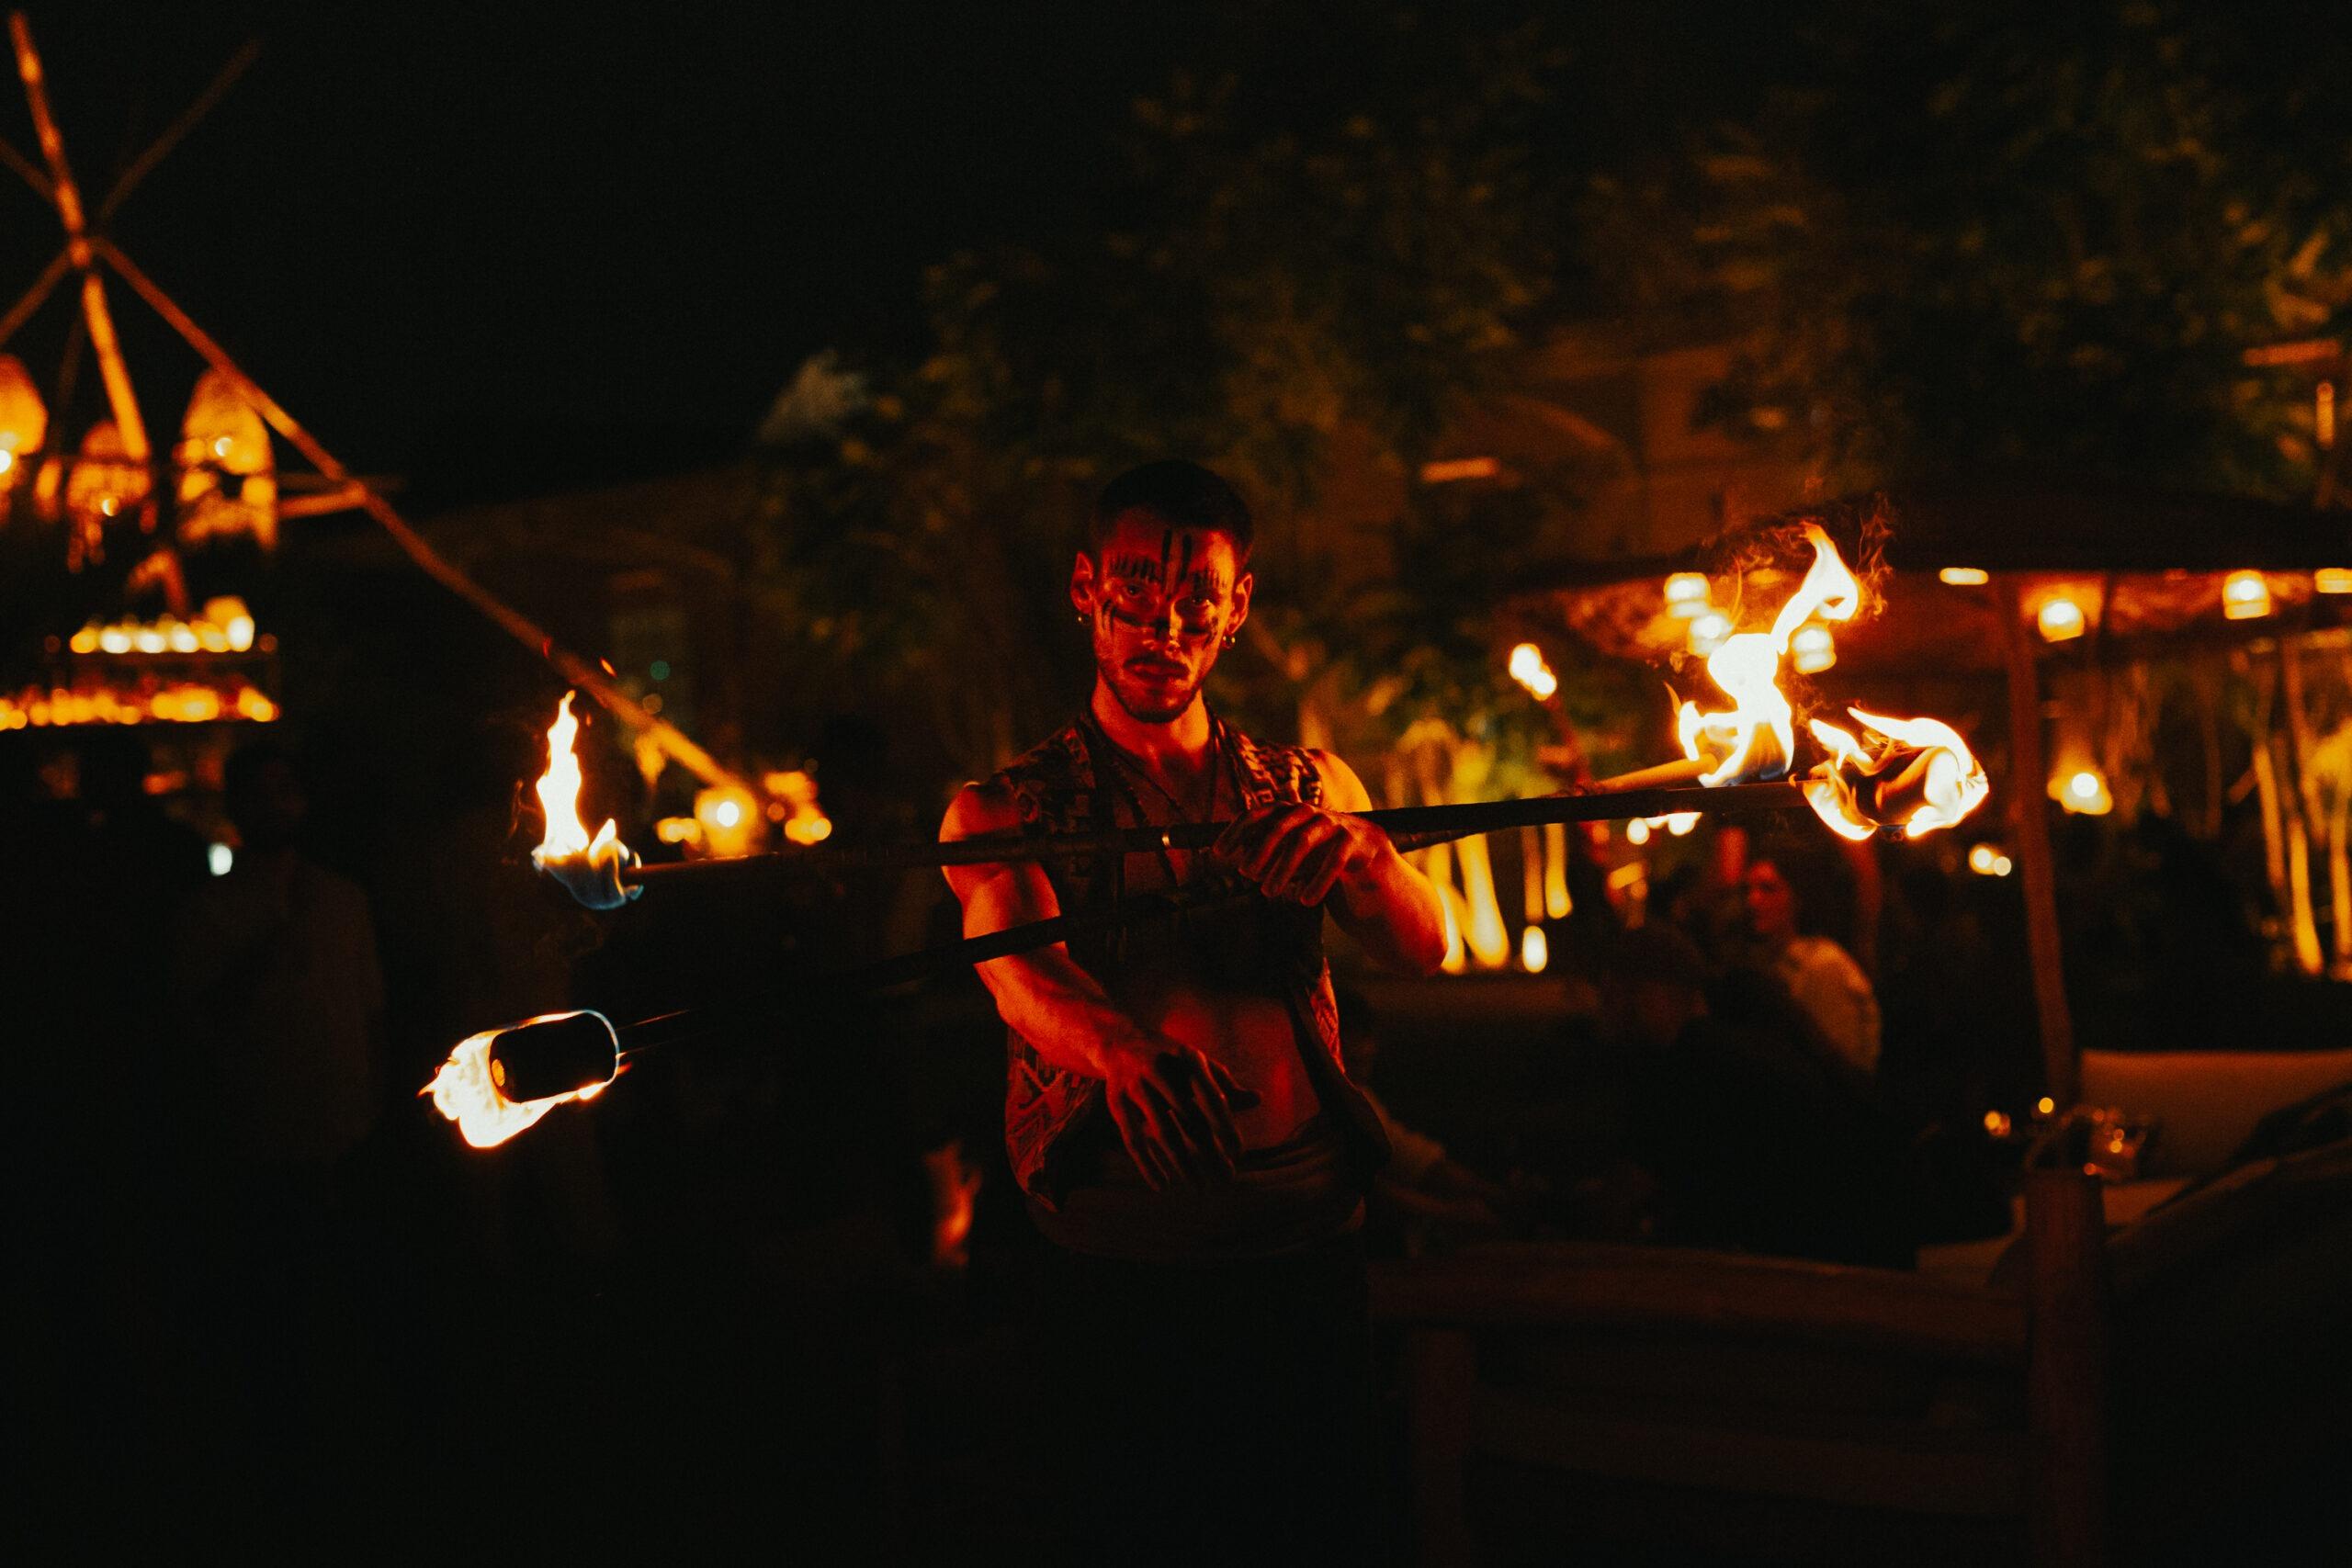 Nicola Colleoni Performarte – The Sanctuary Eco Retreat Milano – performer – double contact staff – fire